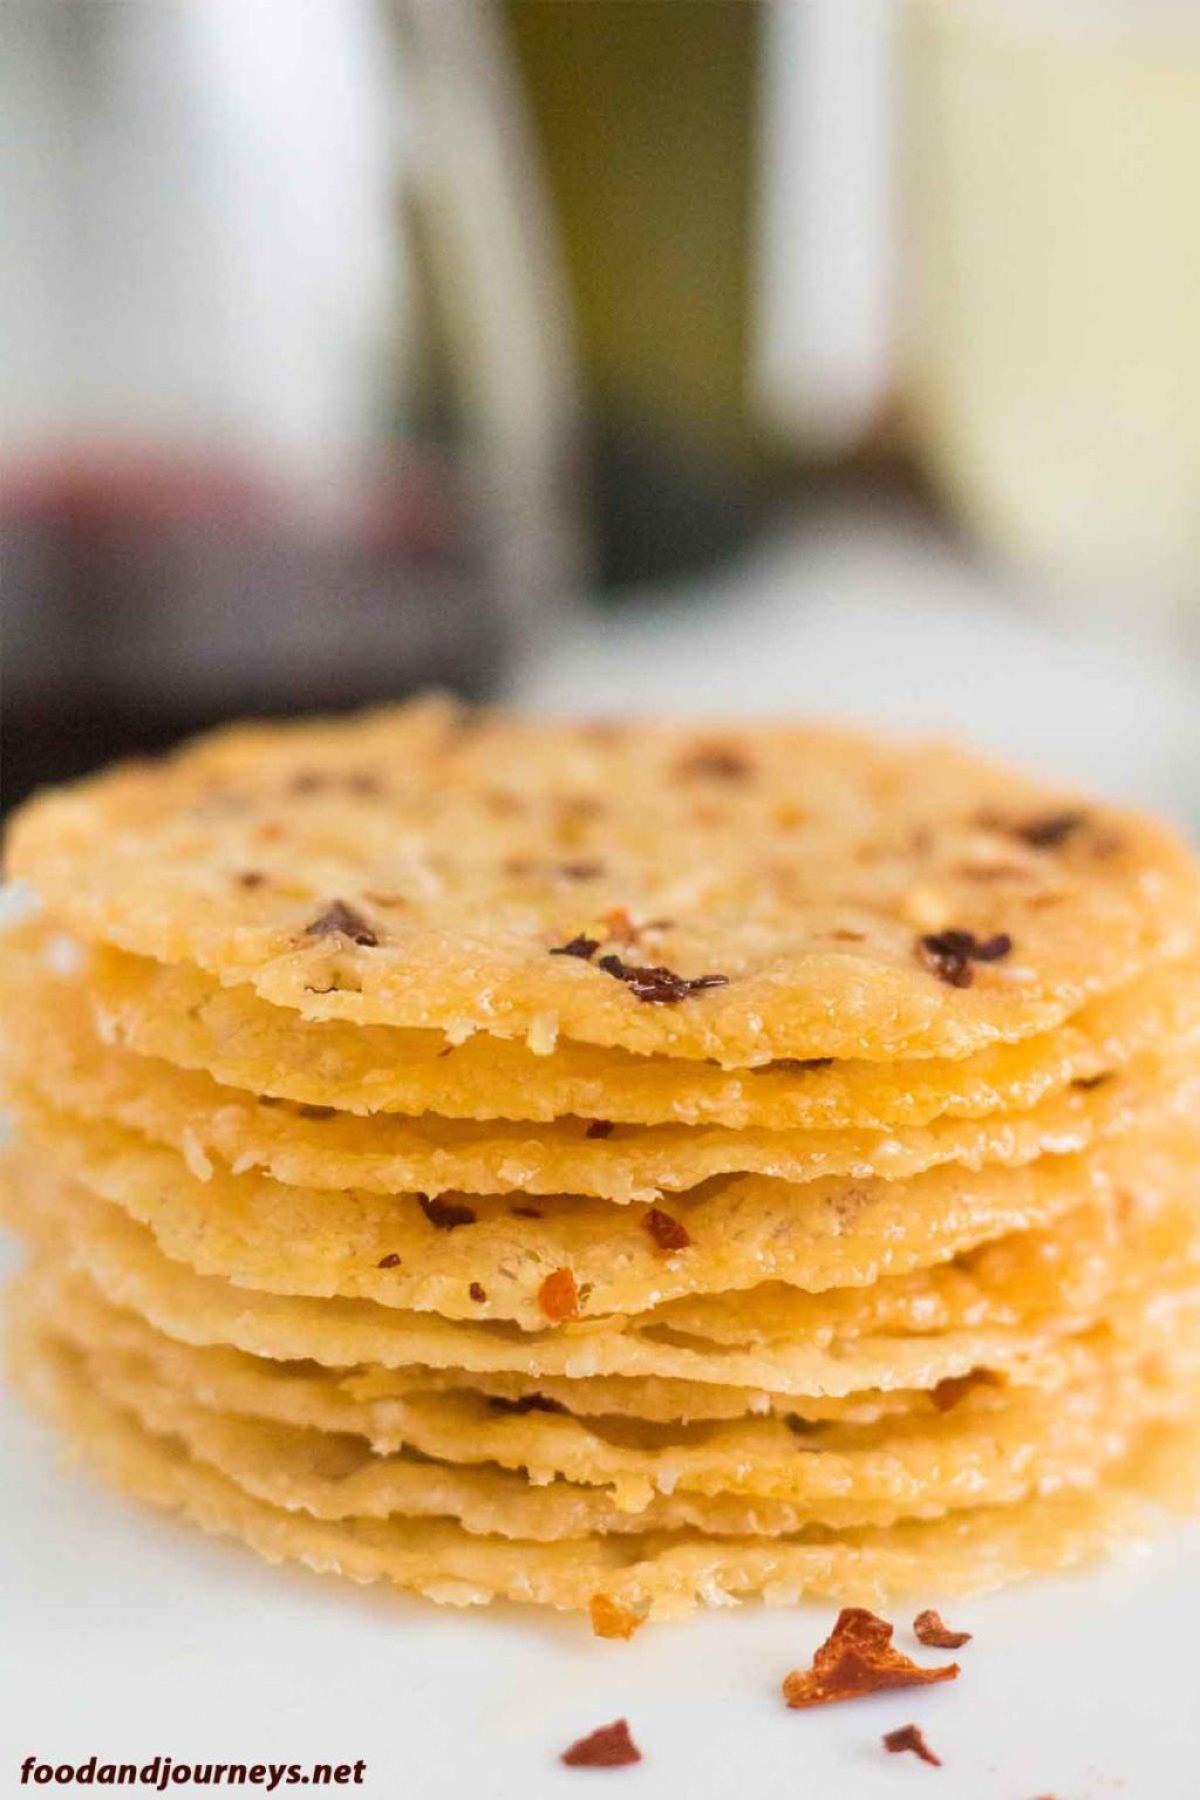 Parmesan & Chili Crisps pic1|foodandjourneys.net